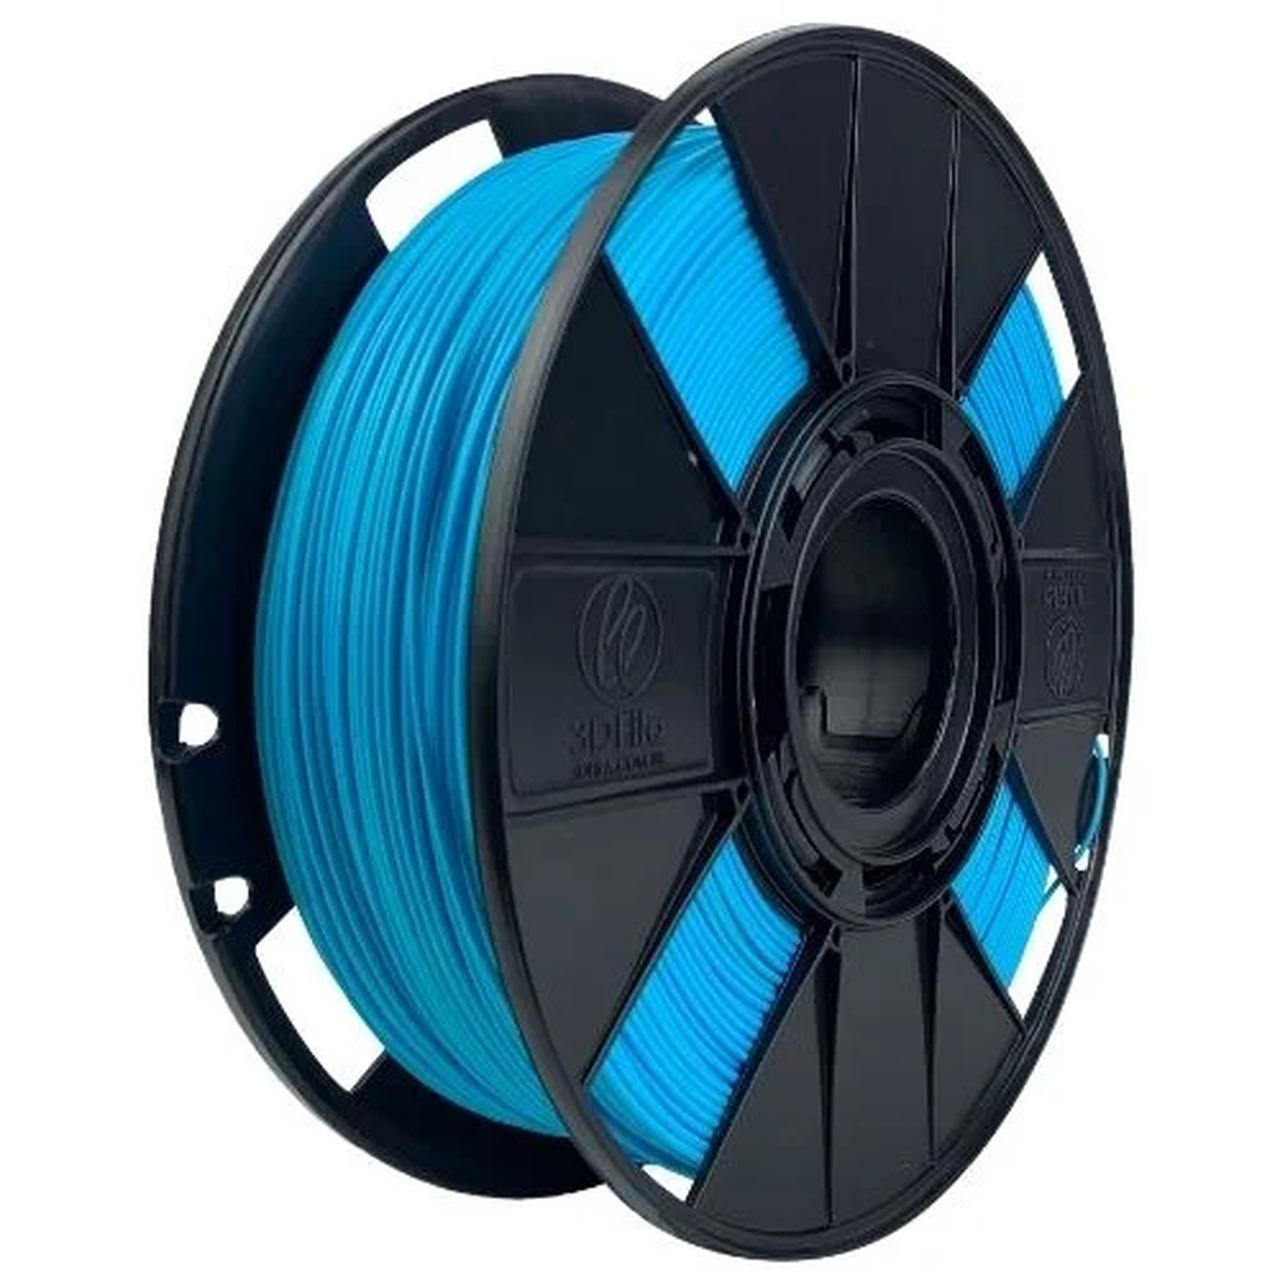 Filamento PLA Basic - Azul Claro - 3D Fila - 1.75mm - 1kg